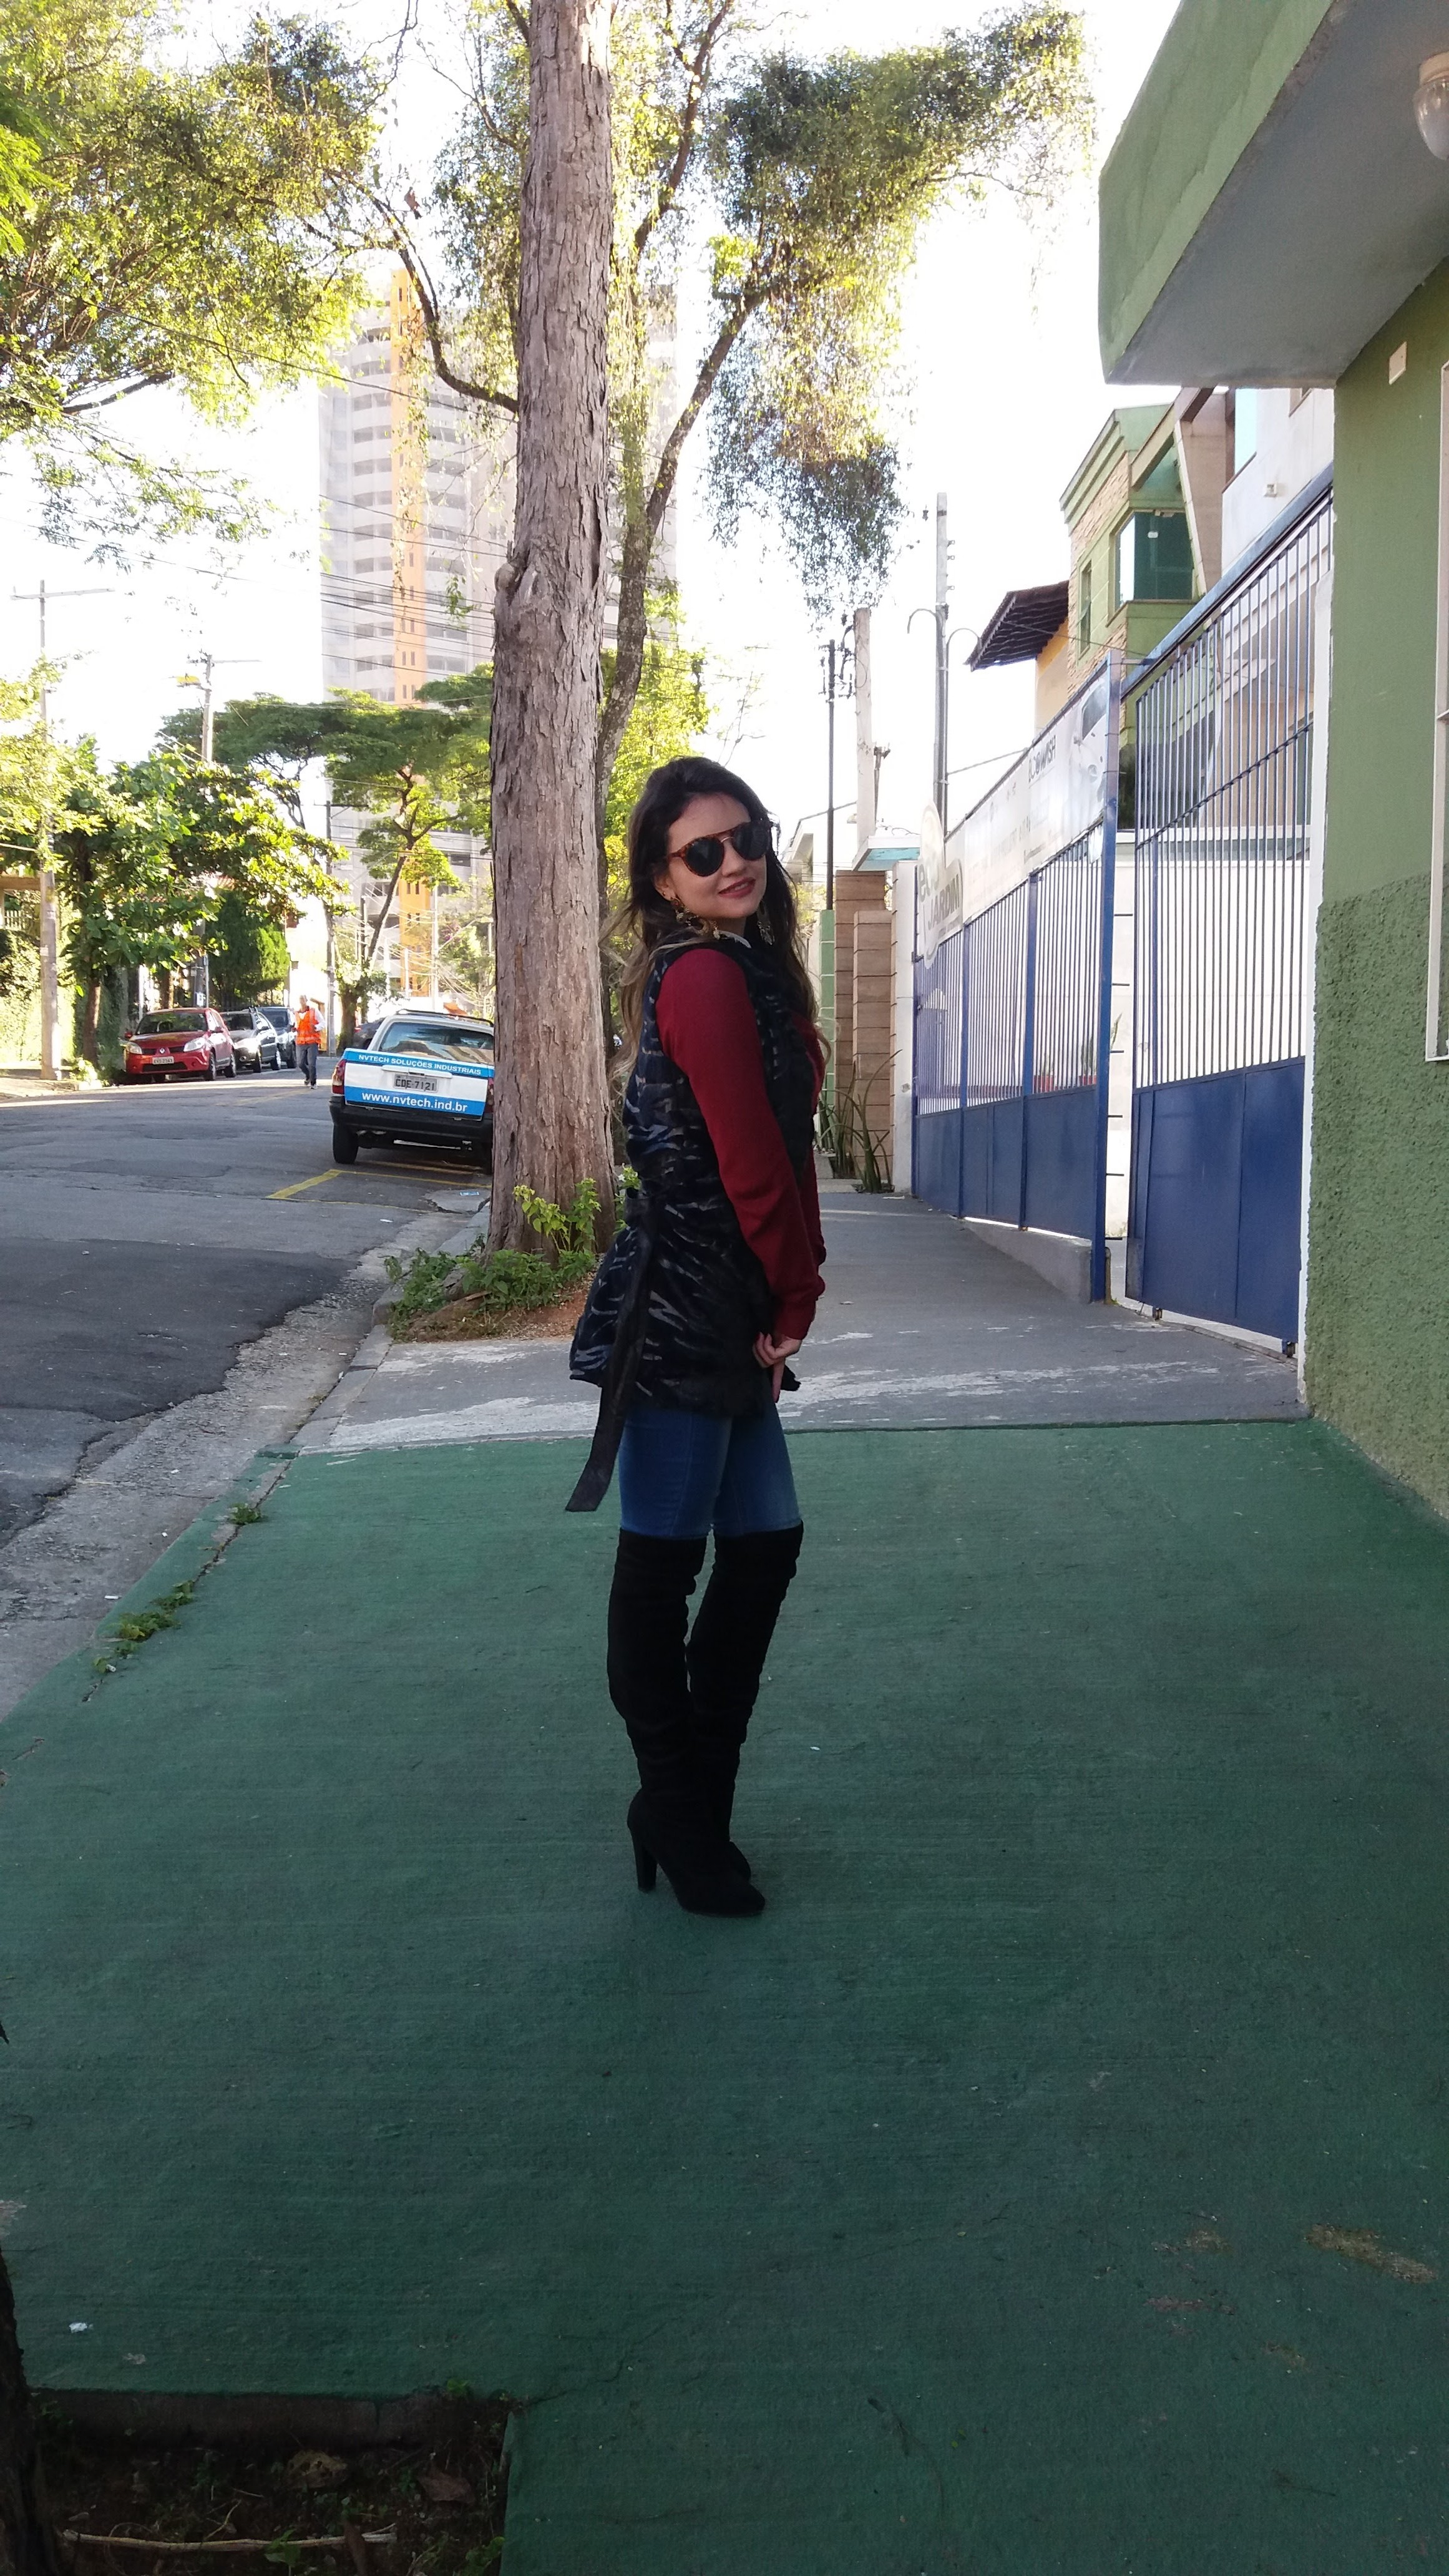 20160612_160319 Look da Ka: Inverno quentinha e fashion